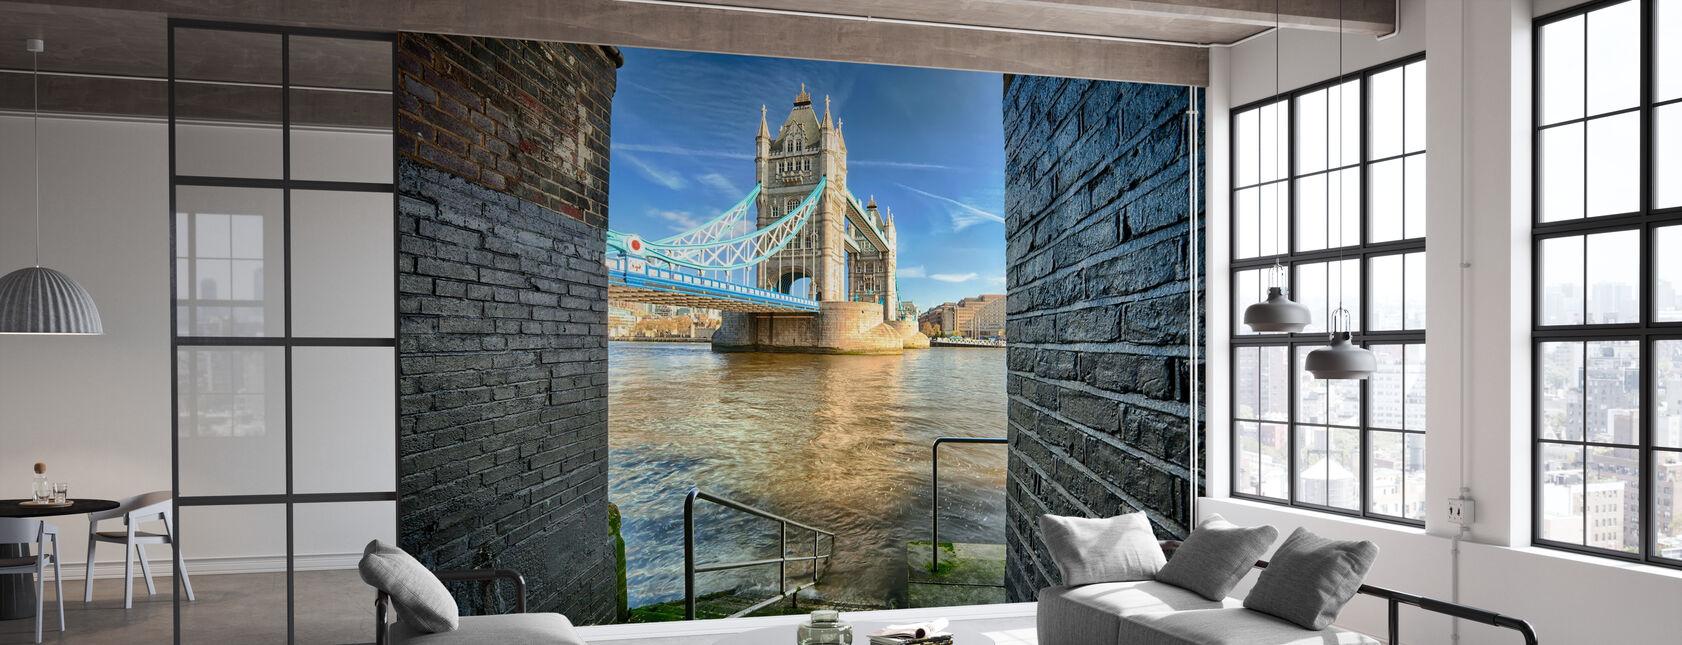 Alternative View on Tower Bridge - Wallpaper - Office